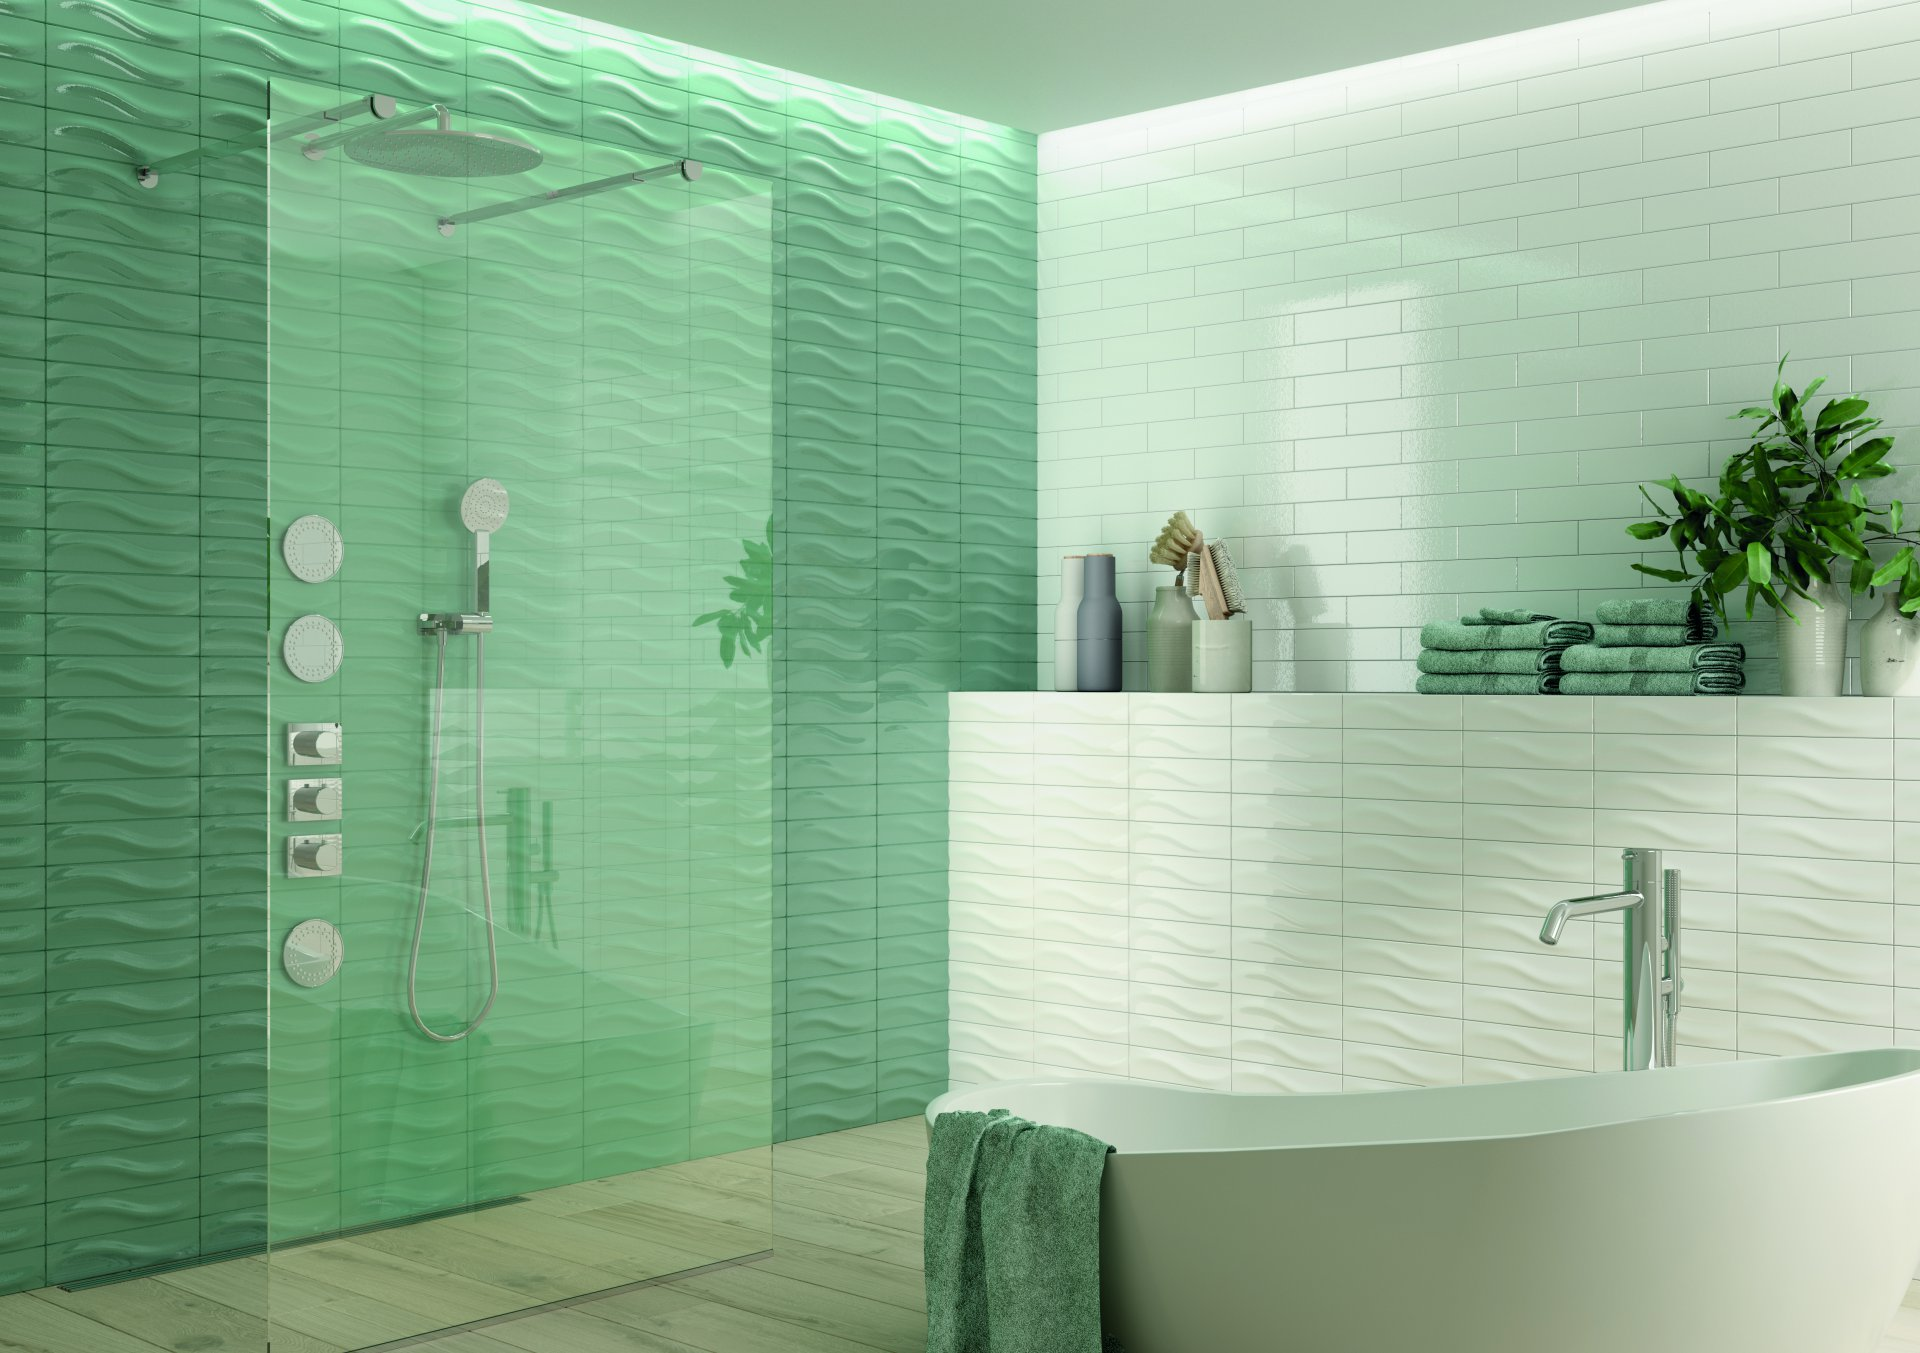 3x12 Bellini Metro Decor Turquesa Ceramic Glossy Wall Tile